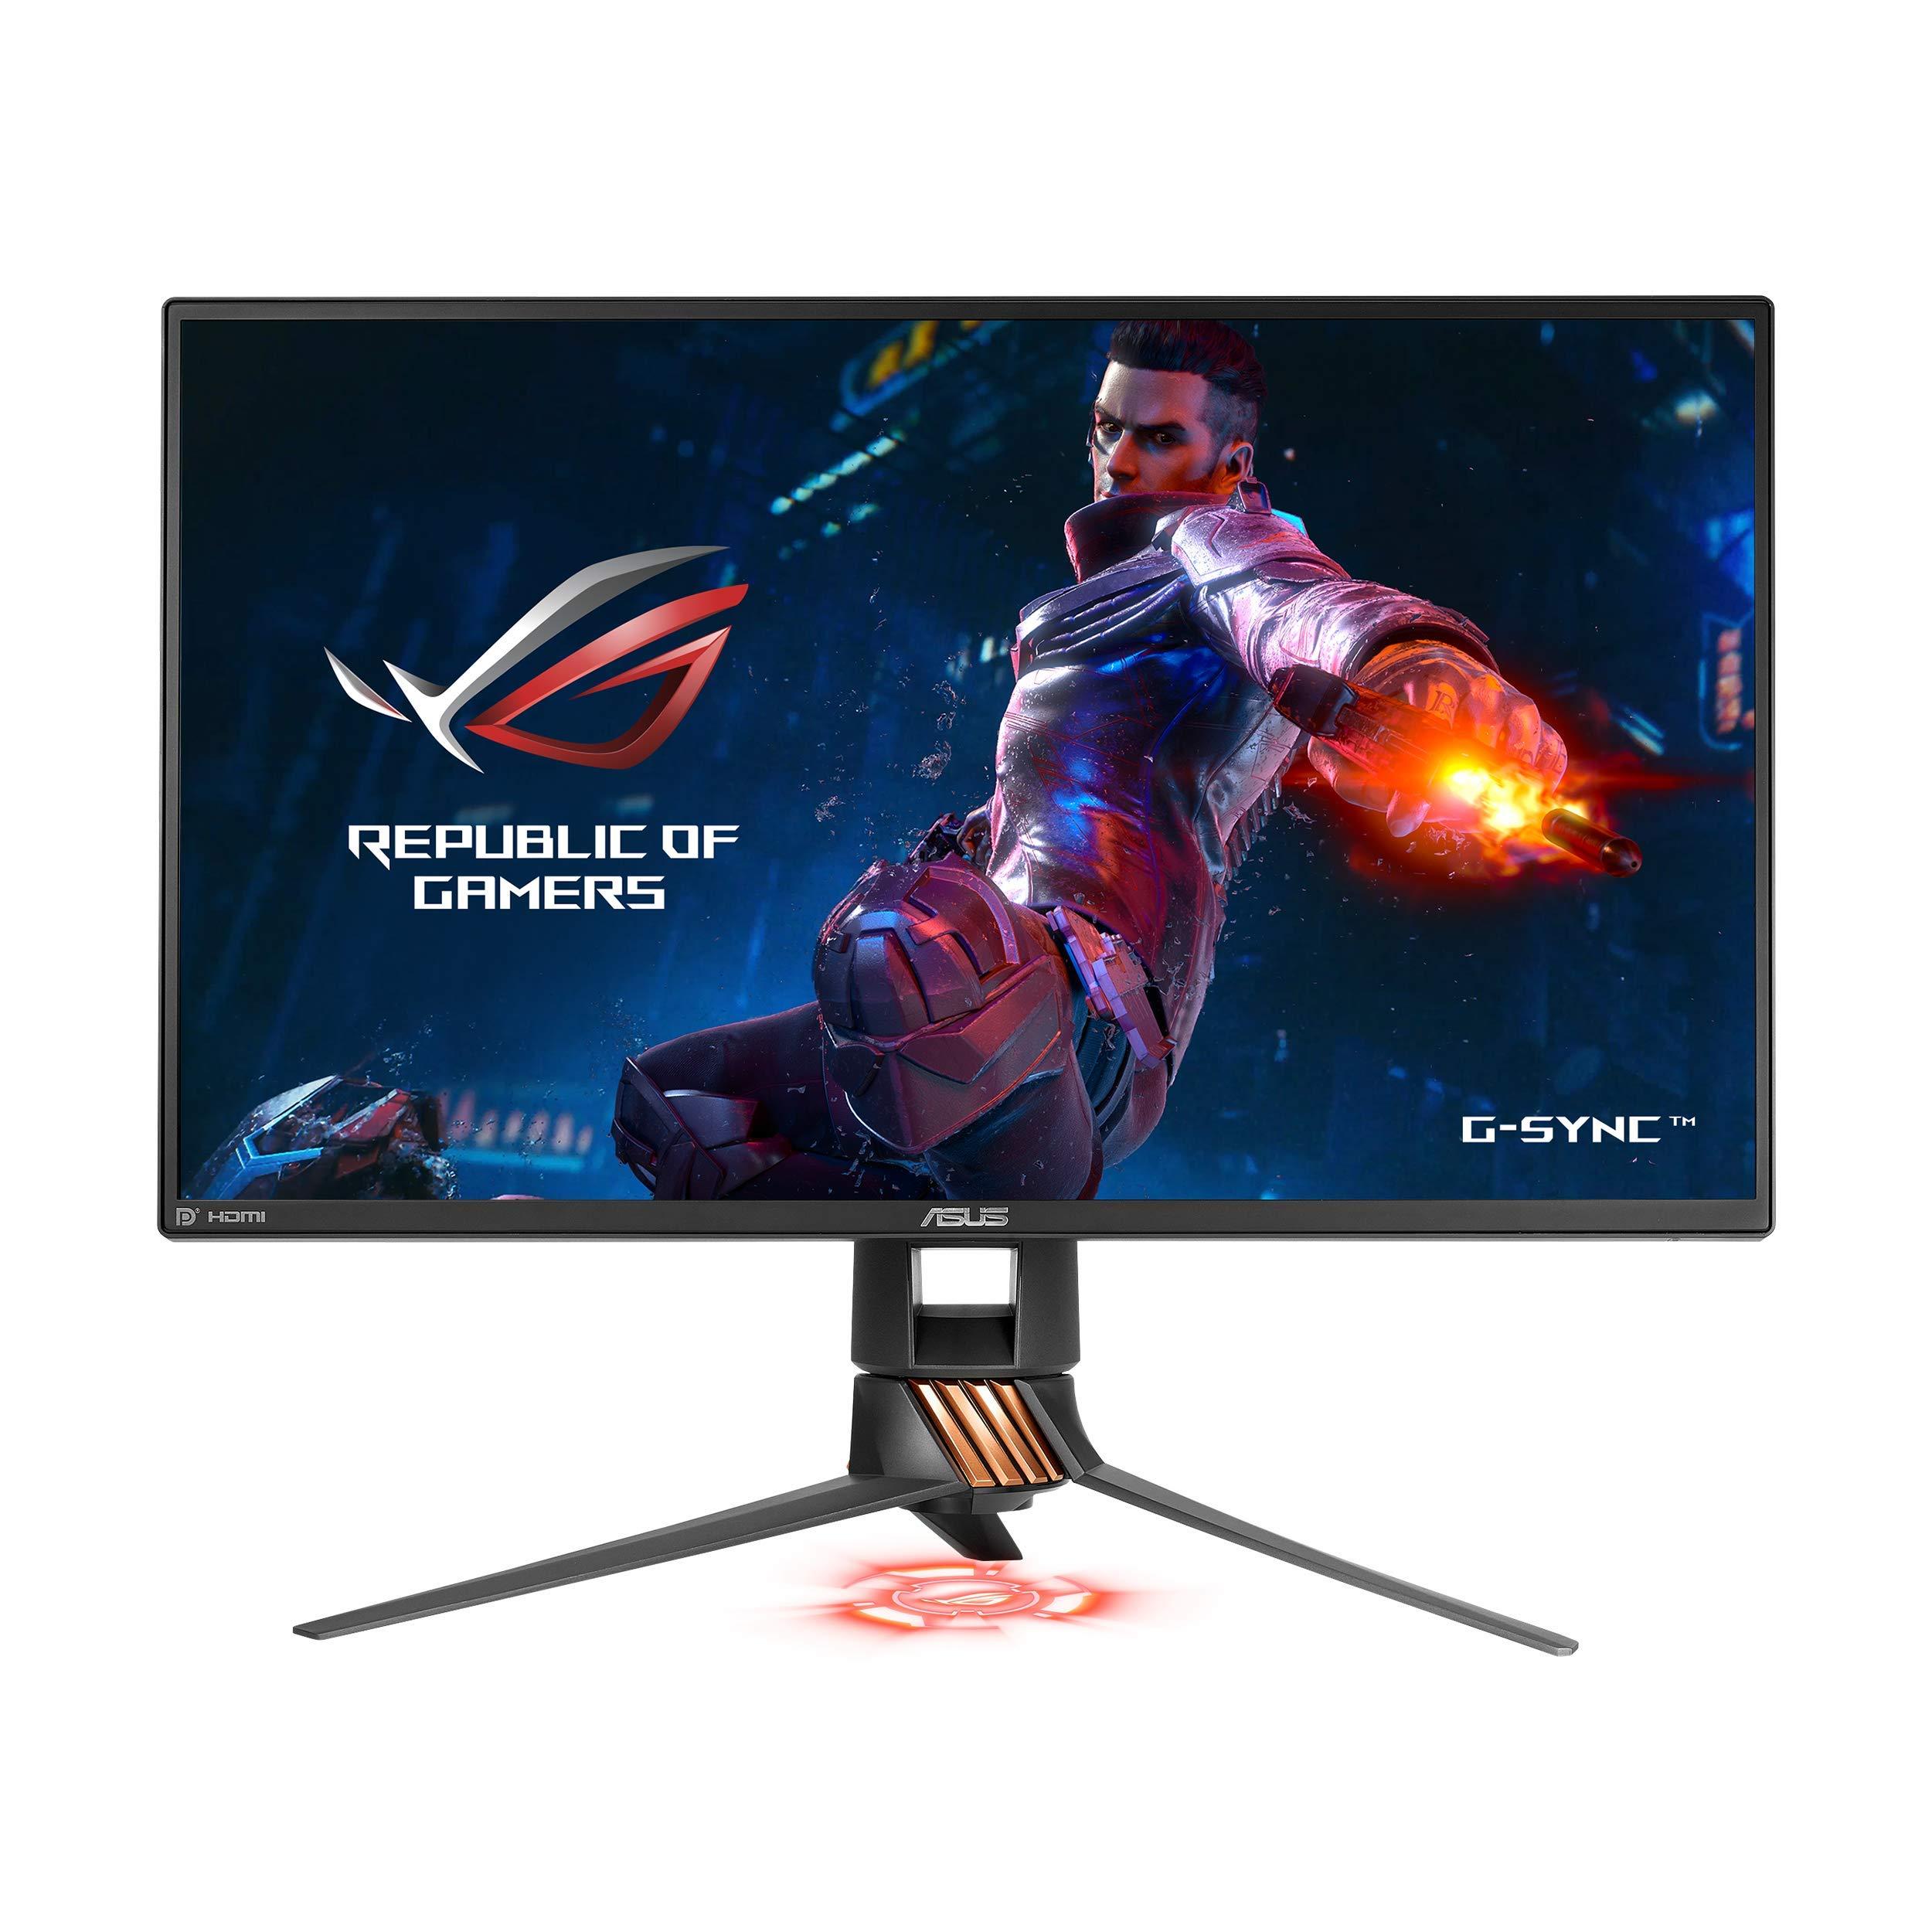 ASUS ROG Swift PG258Q 24.5'' Gaming Monitor Full HD 1080p 1ms 240Hz DP HDMI Eye Care G-SYNC Esports